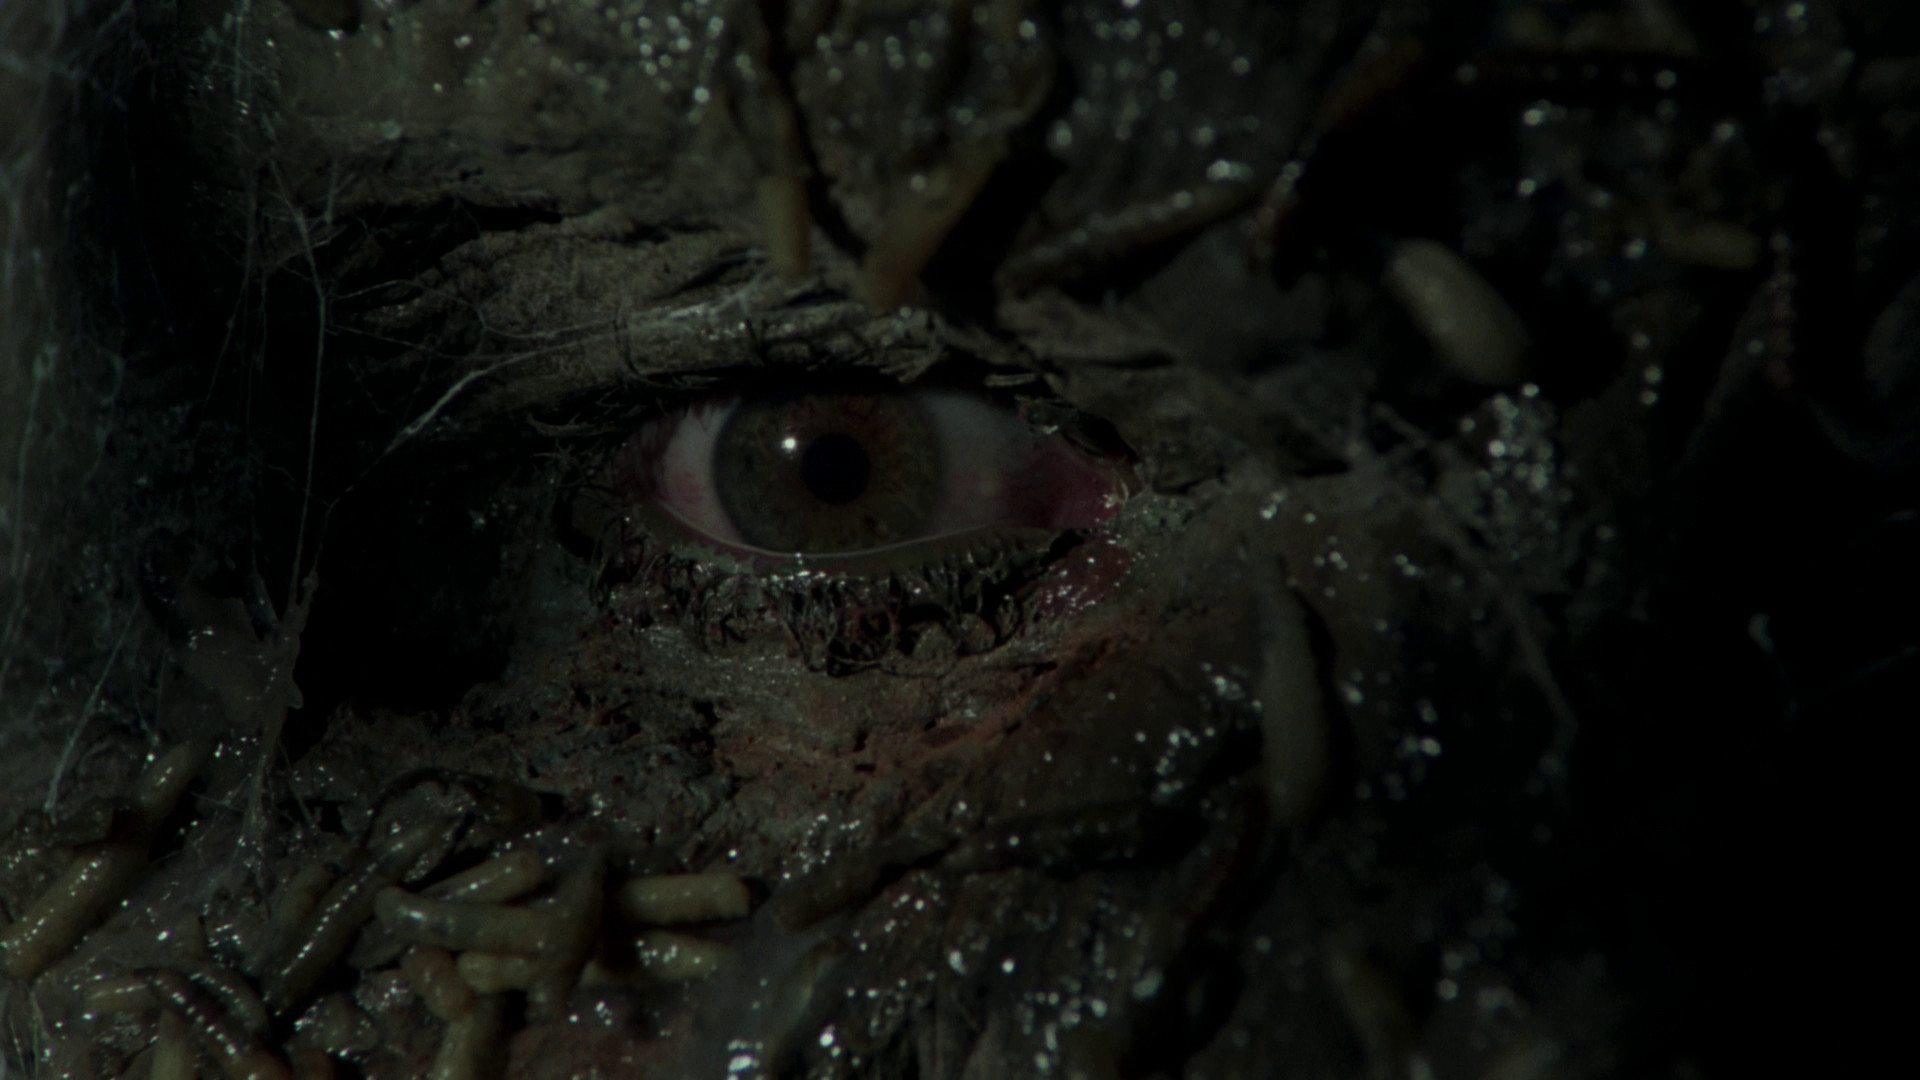 Res: 1920x1080, Movie - Jason Lives: Friday the 13th Part VI Wallpaper